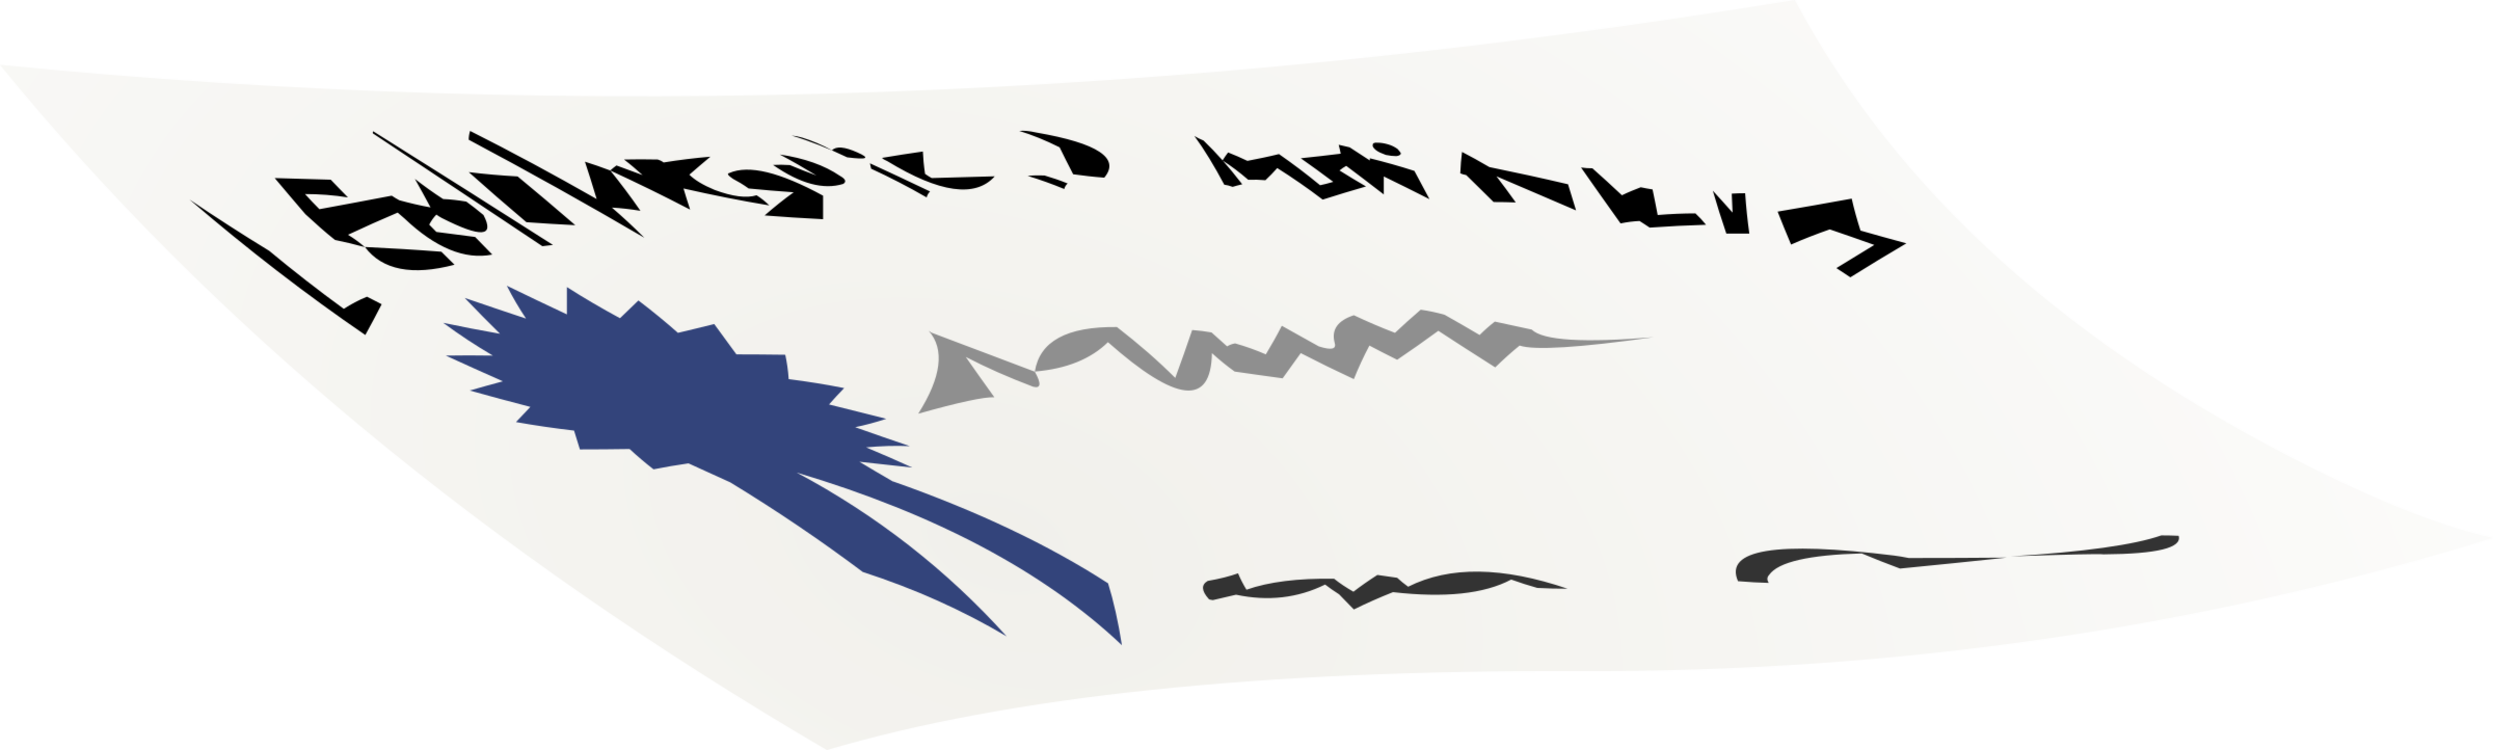 Calligraphy,Text,Brand